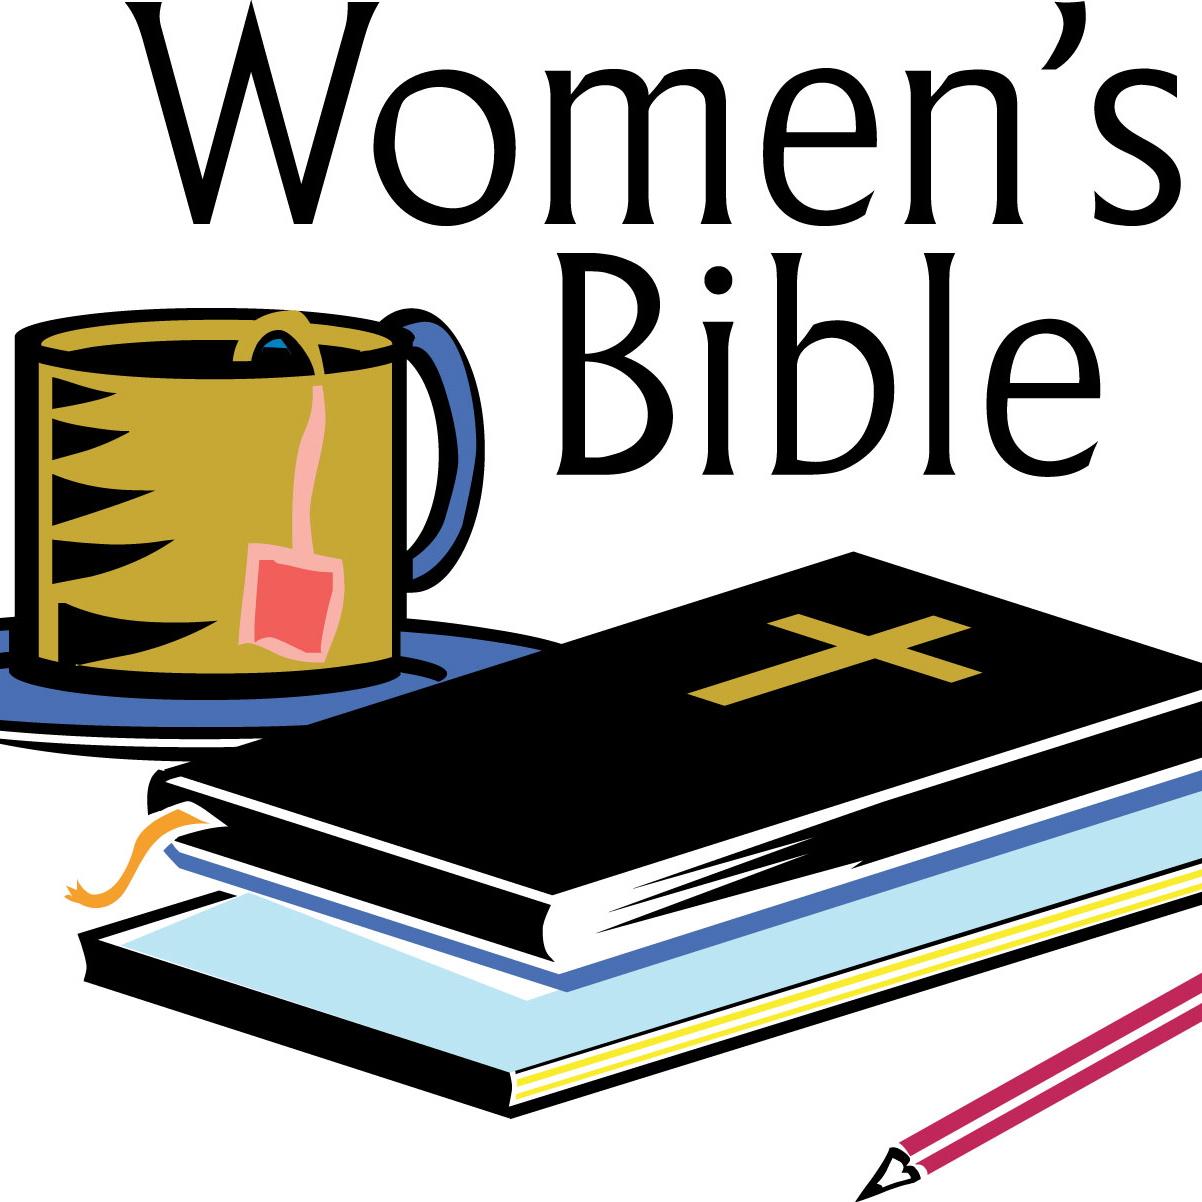 Bible Study Clip Art - Cliparts.co